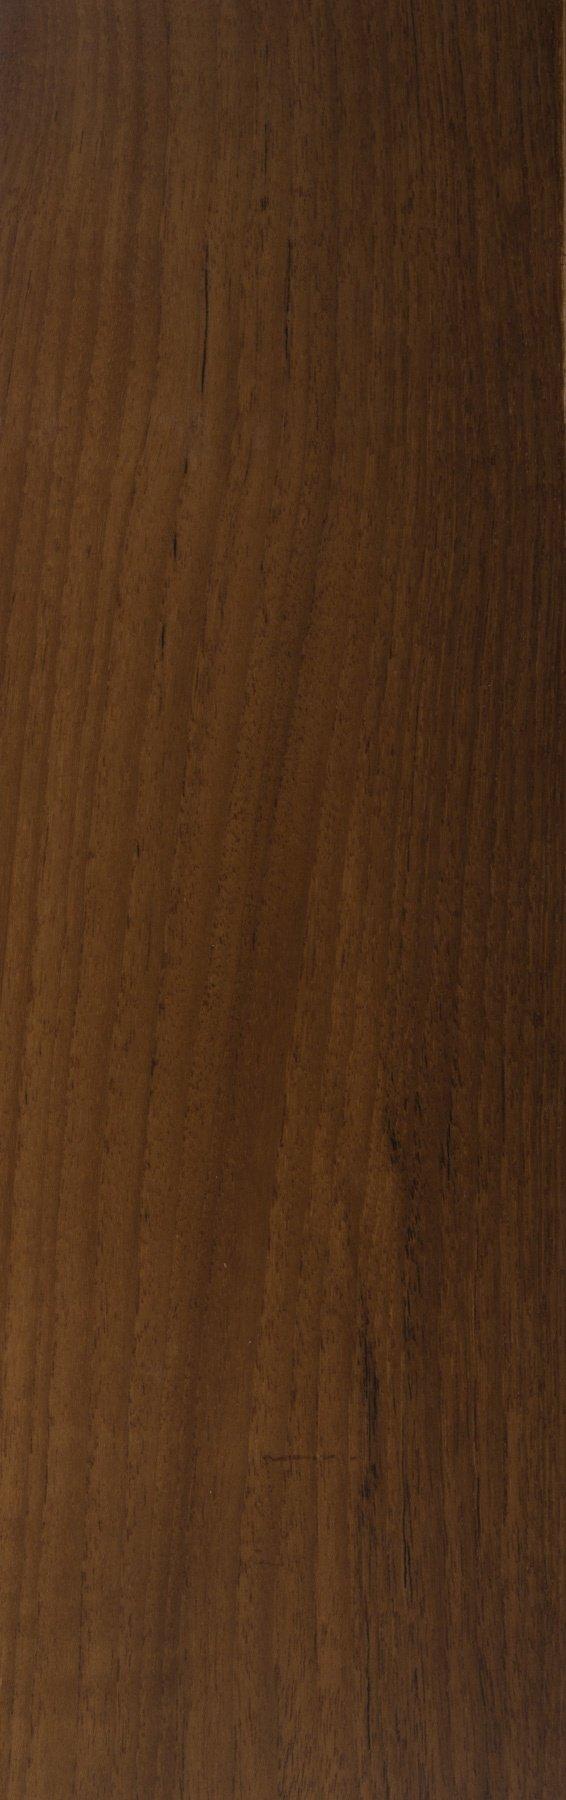 maderas-terramont-loft-life-teak